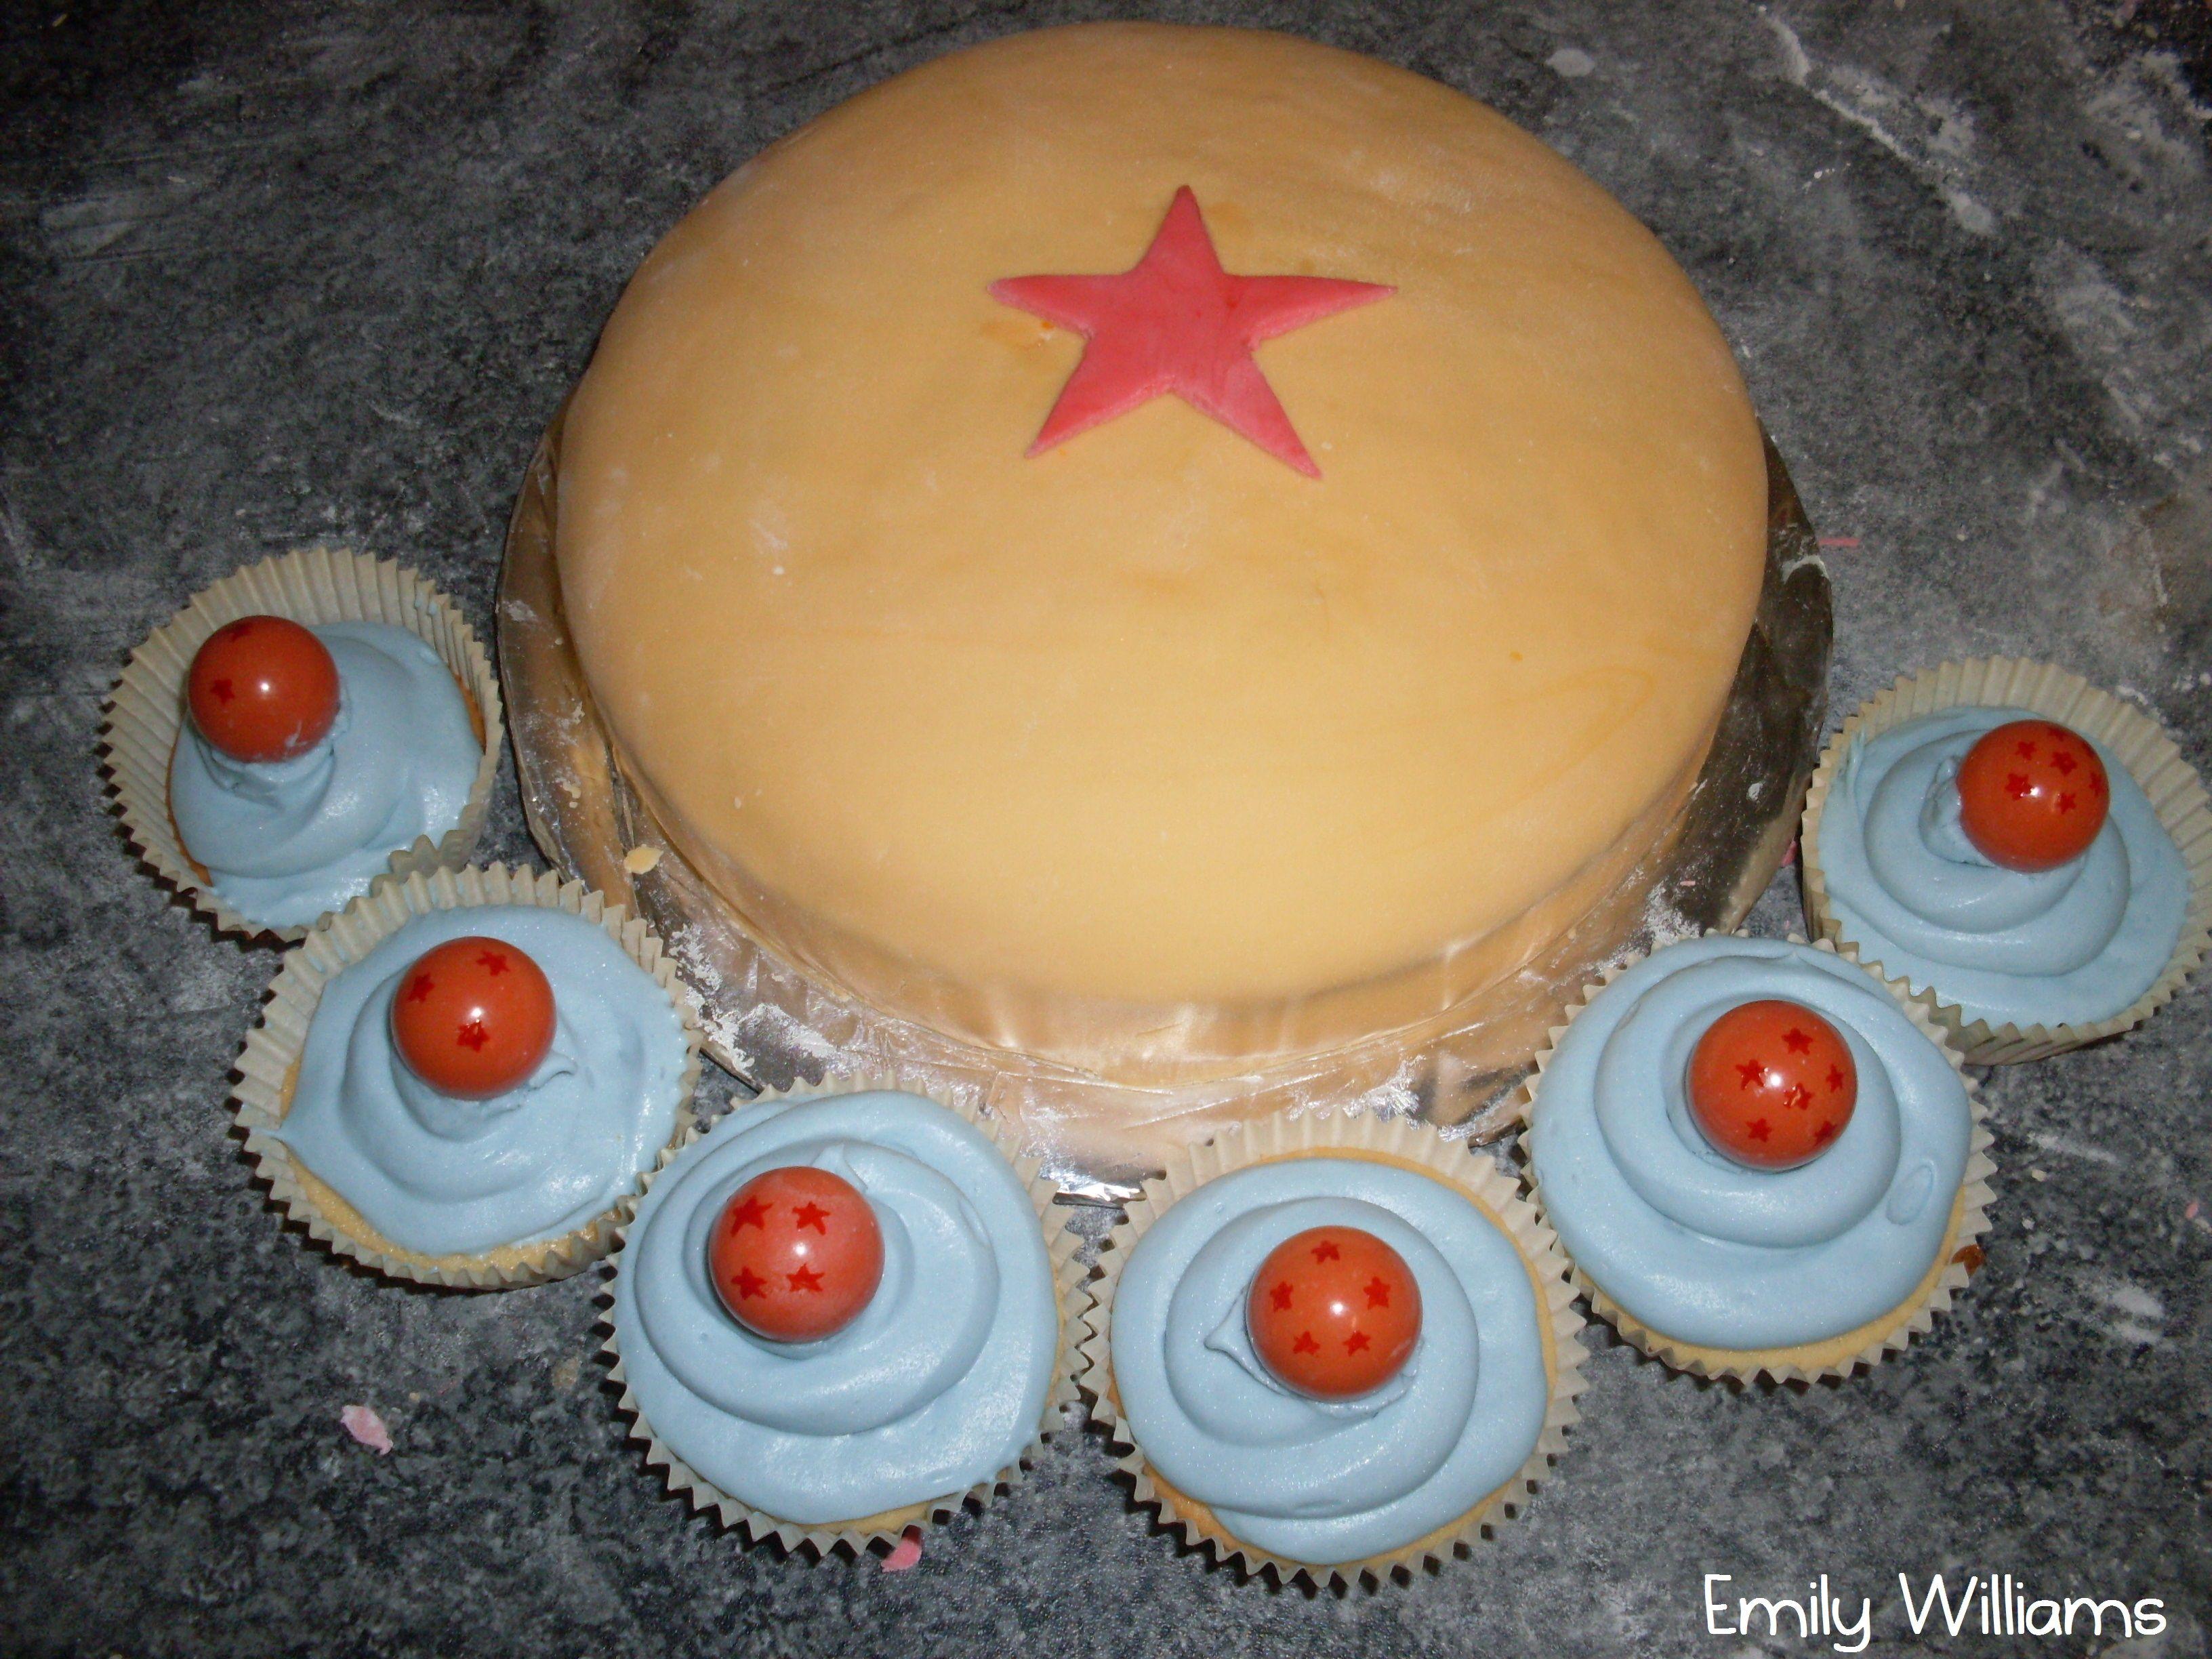 My Dragon Ball Z Dbz Birthday Cake And Cupcakes Recipes